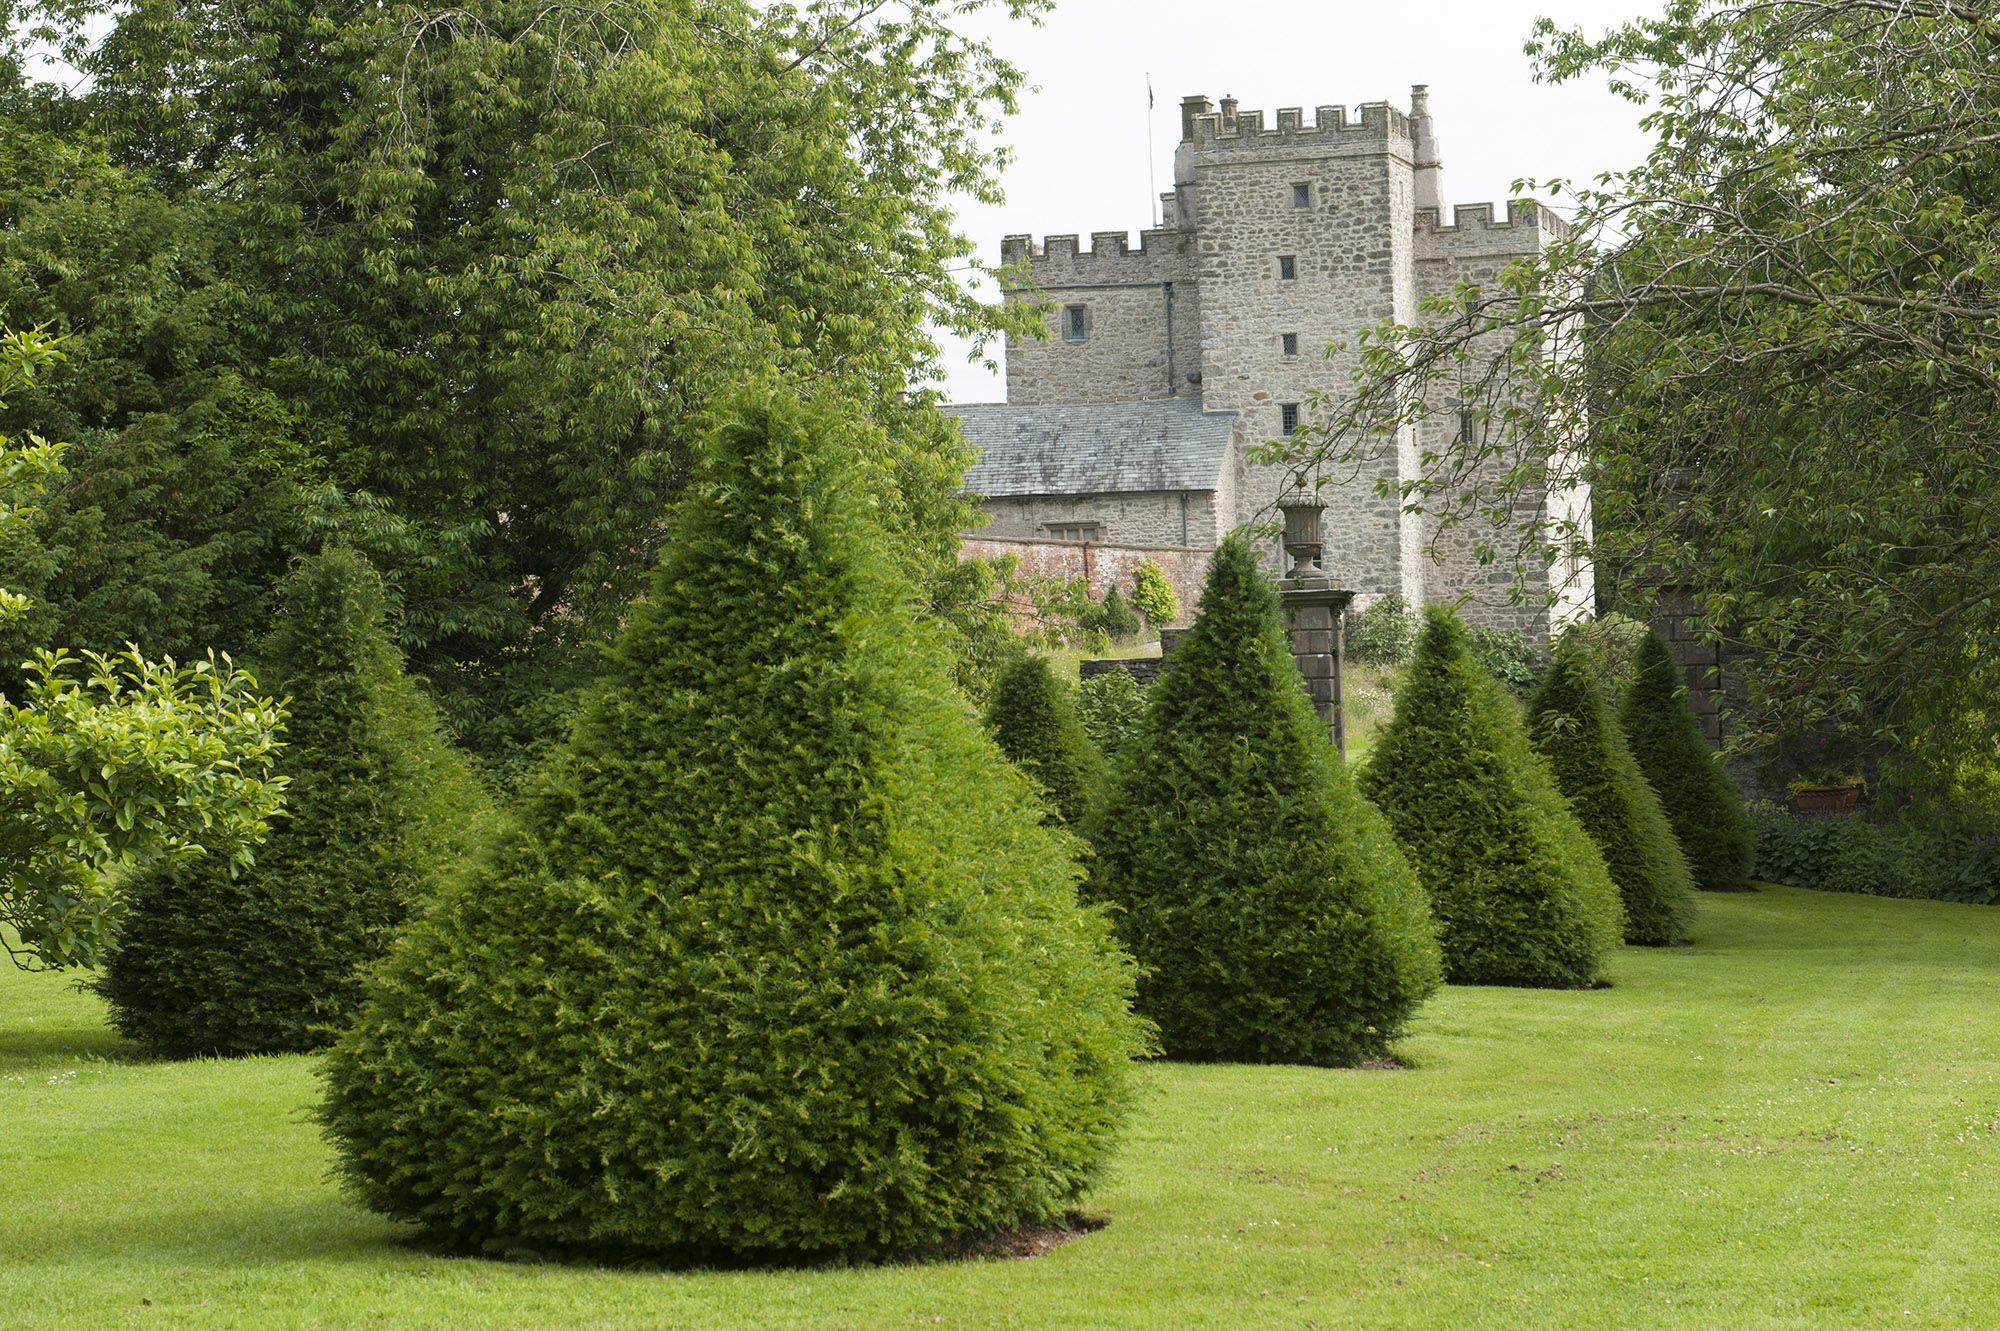 Sizergh Castle (National Trust)